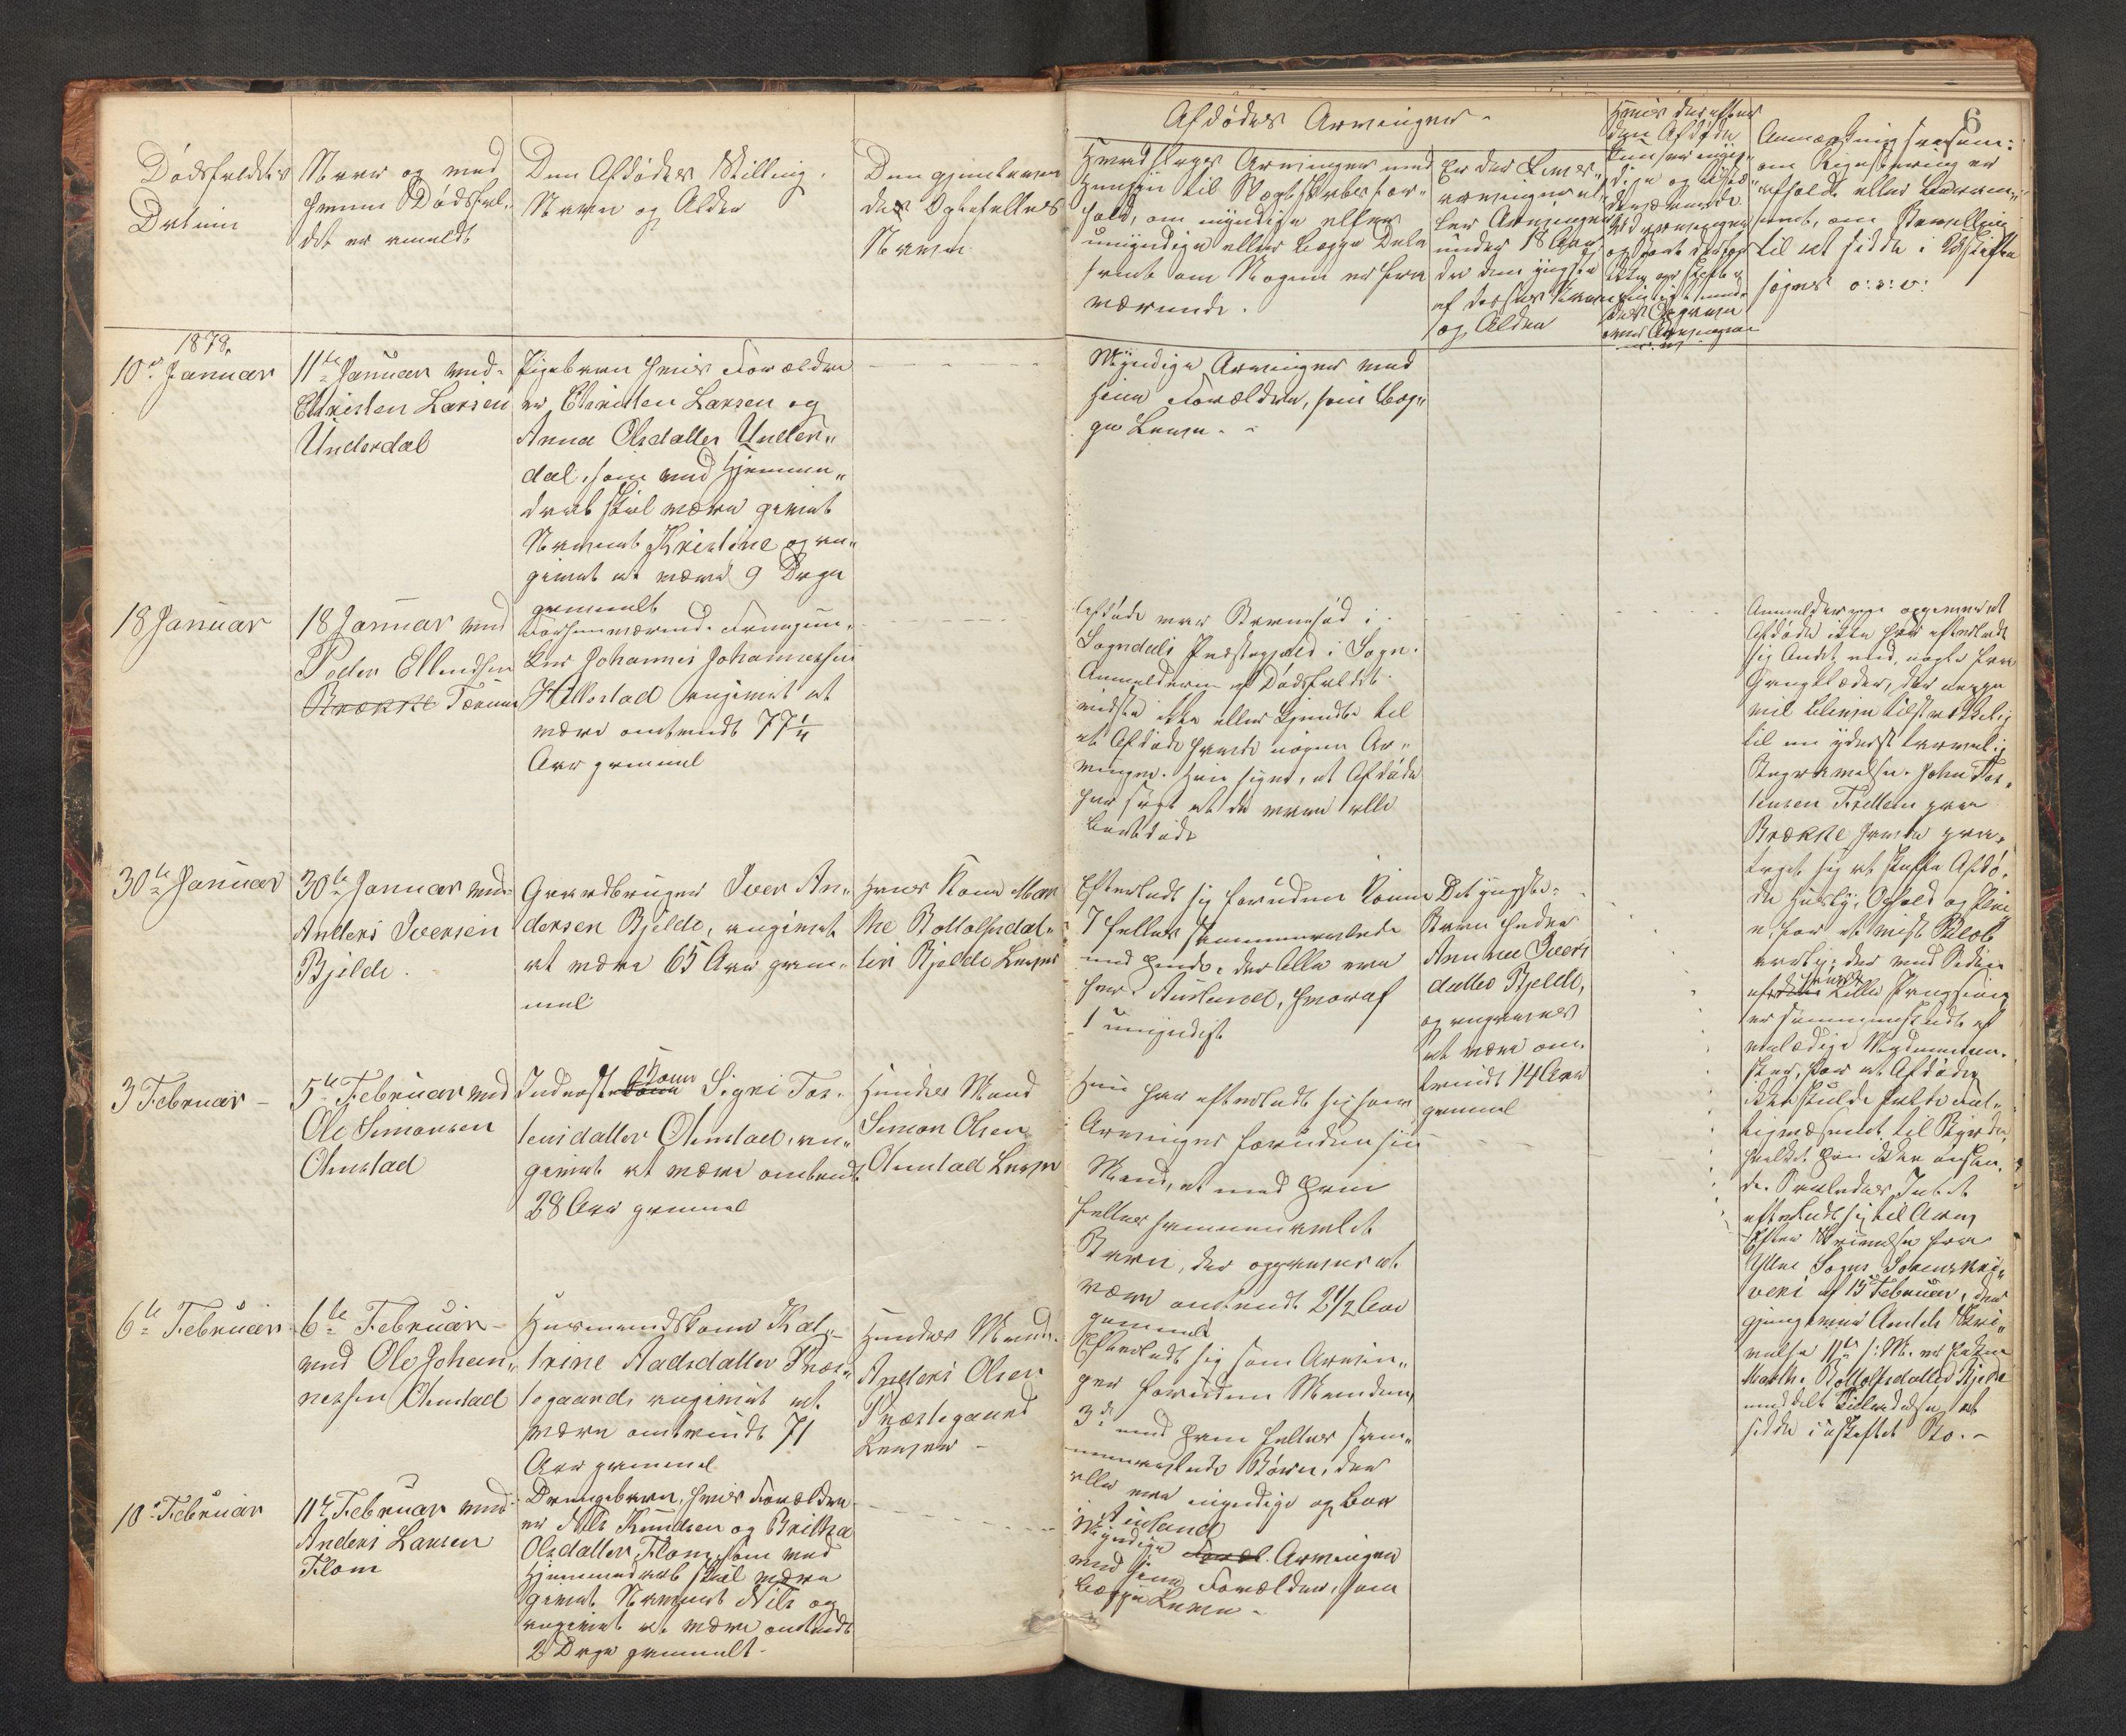 SAB, Lensmannen i Aurland, 0006/L0002: Dødsfallprotokoll, 1877-1892, s. 5b-6a